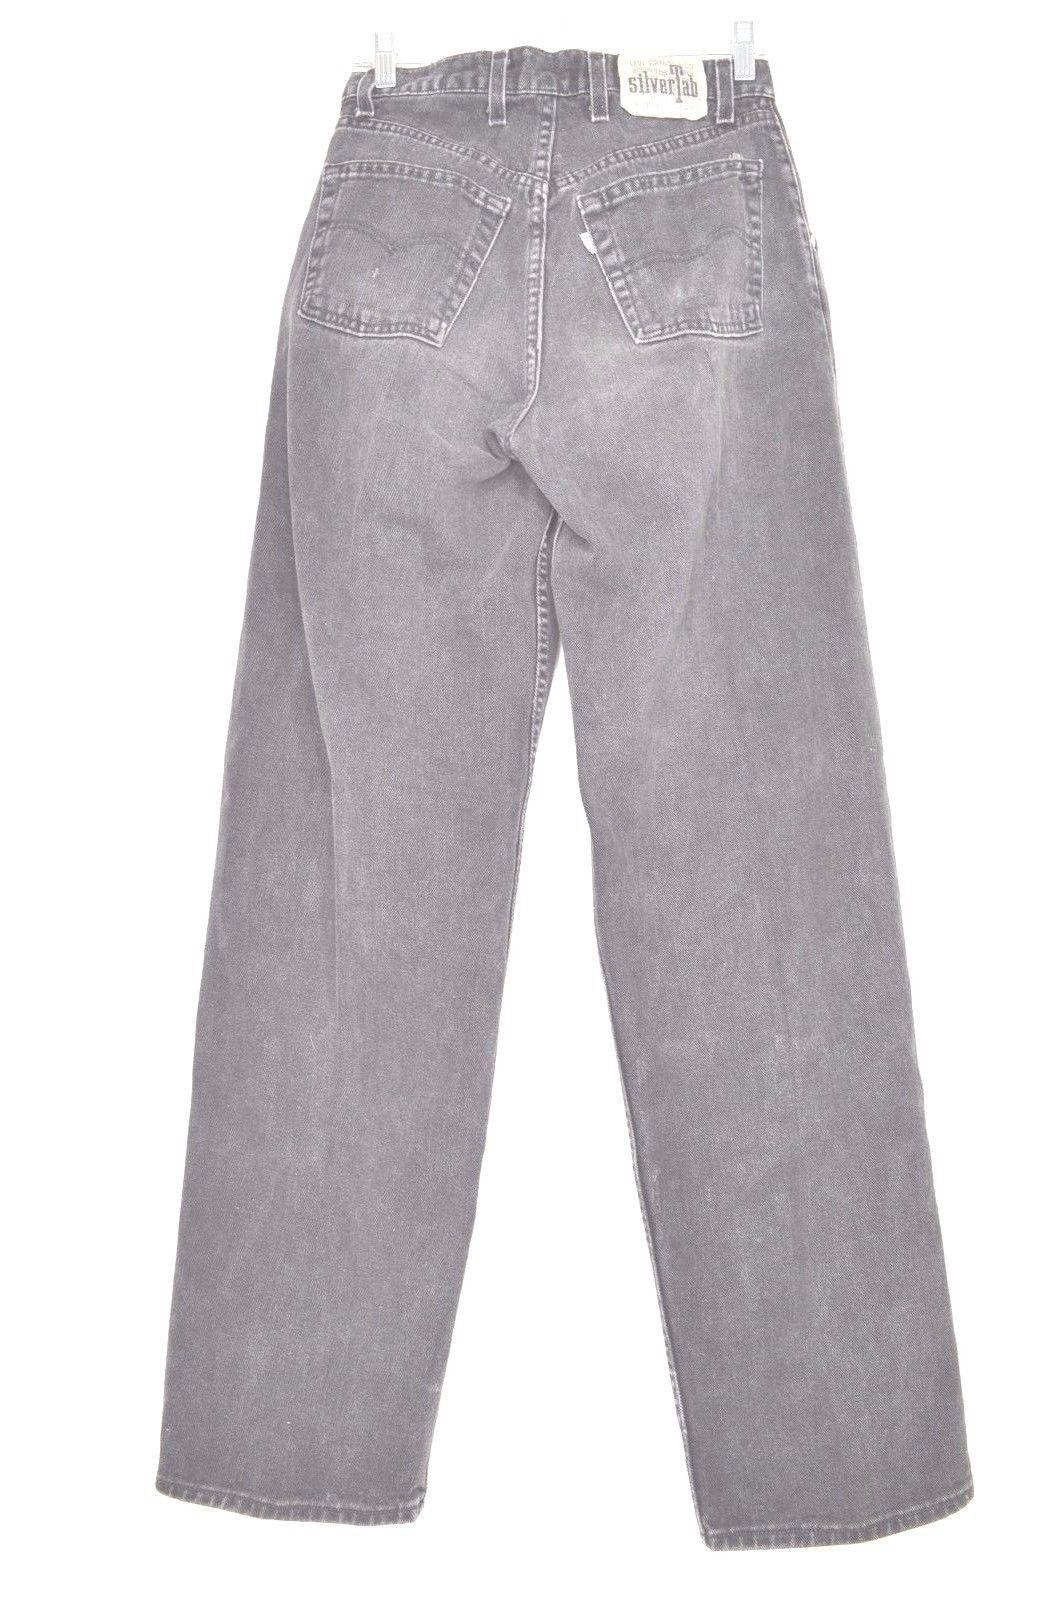 Levi jeans men SilverTab 29x34 USA Baggy vintage black mid rise 100% cotton rap